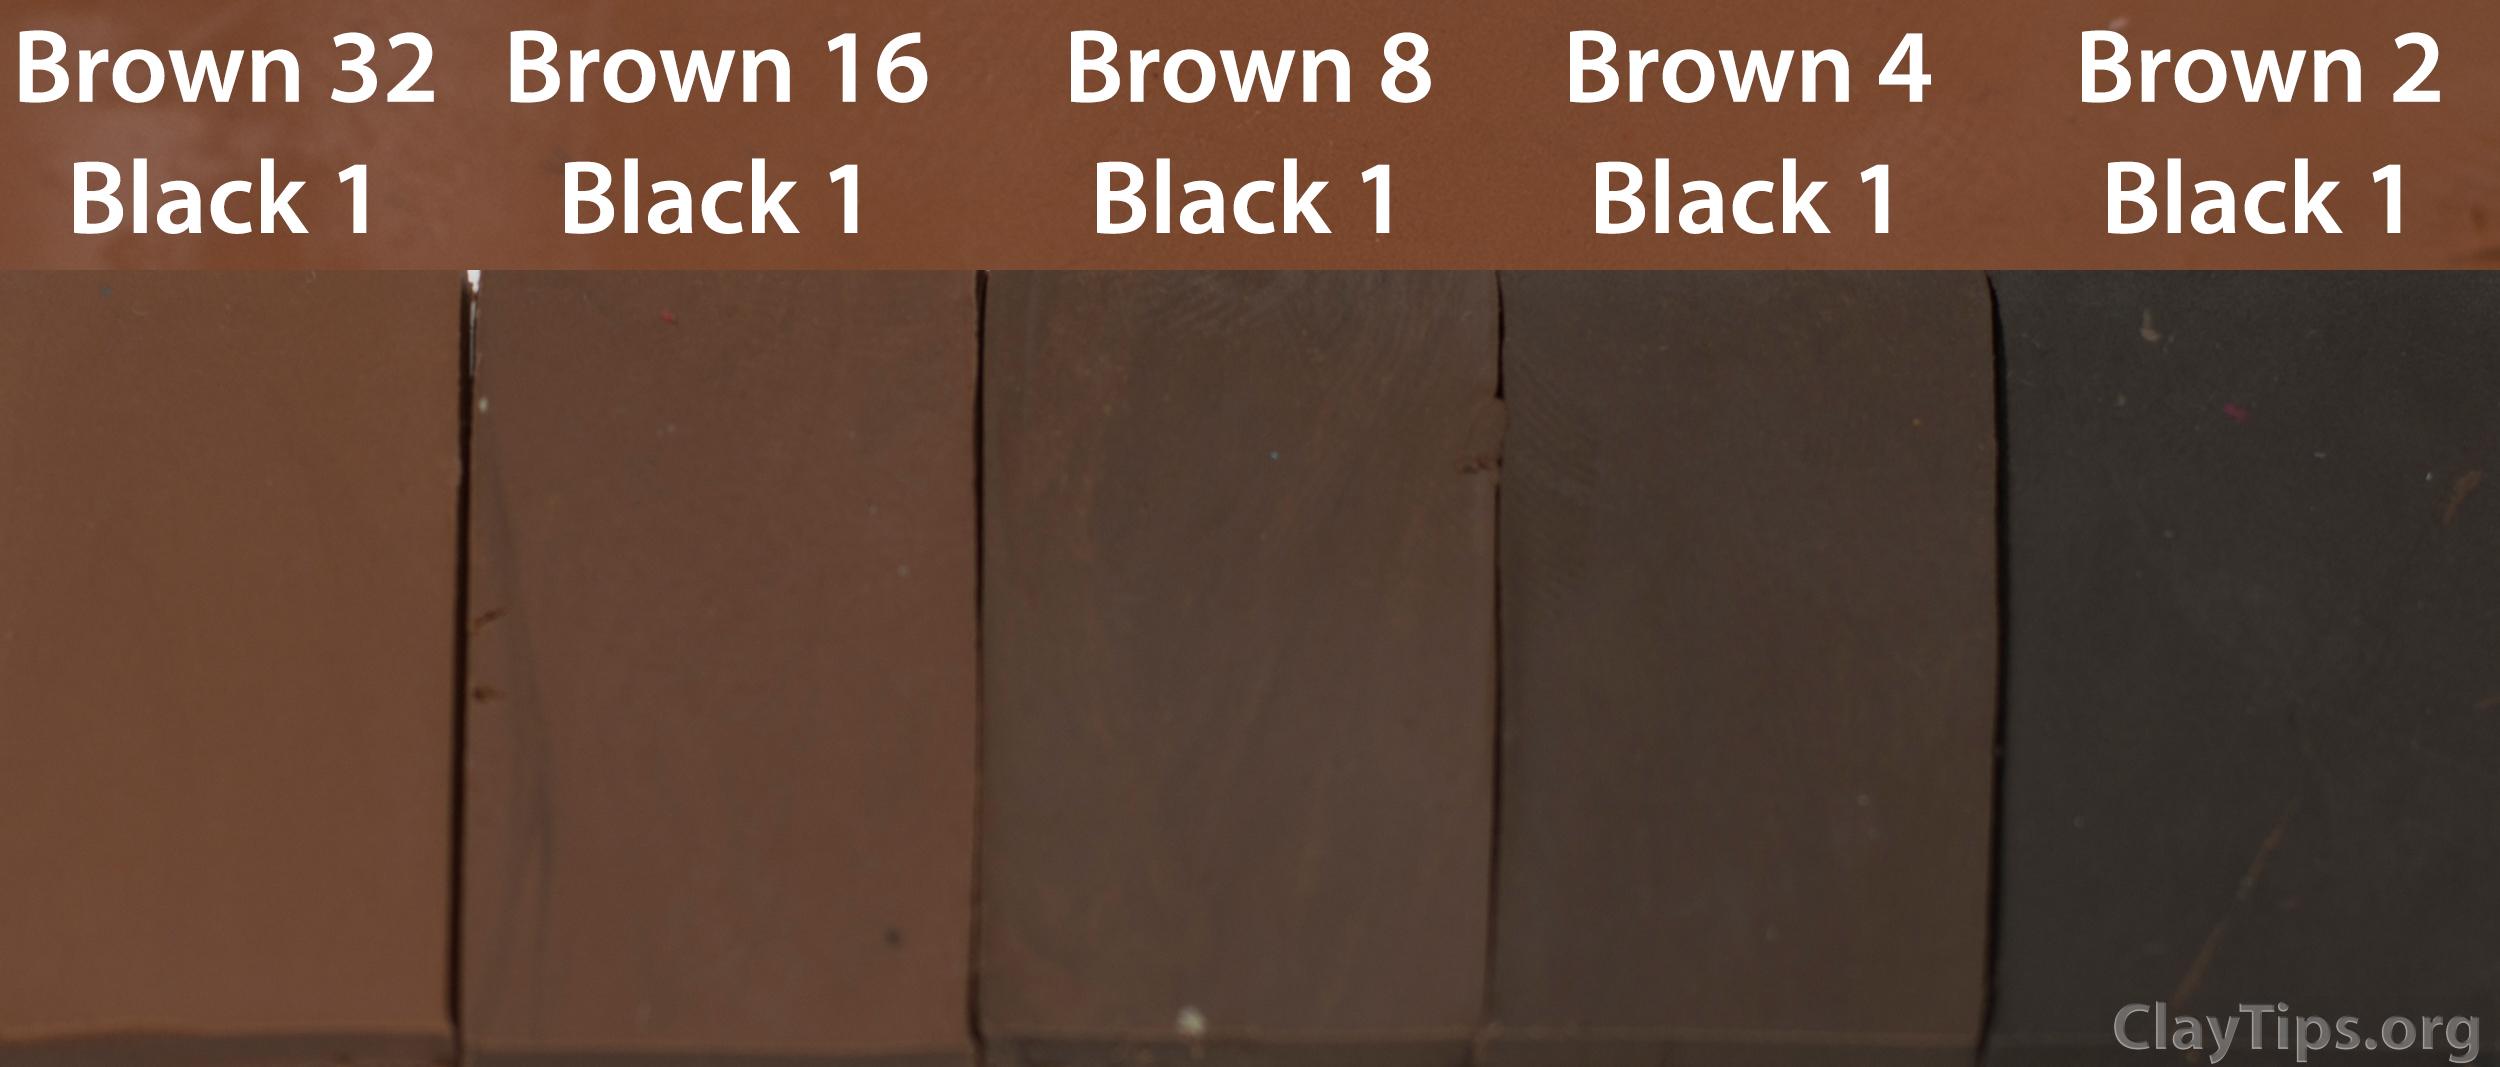 Brown and Black Plasticine